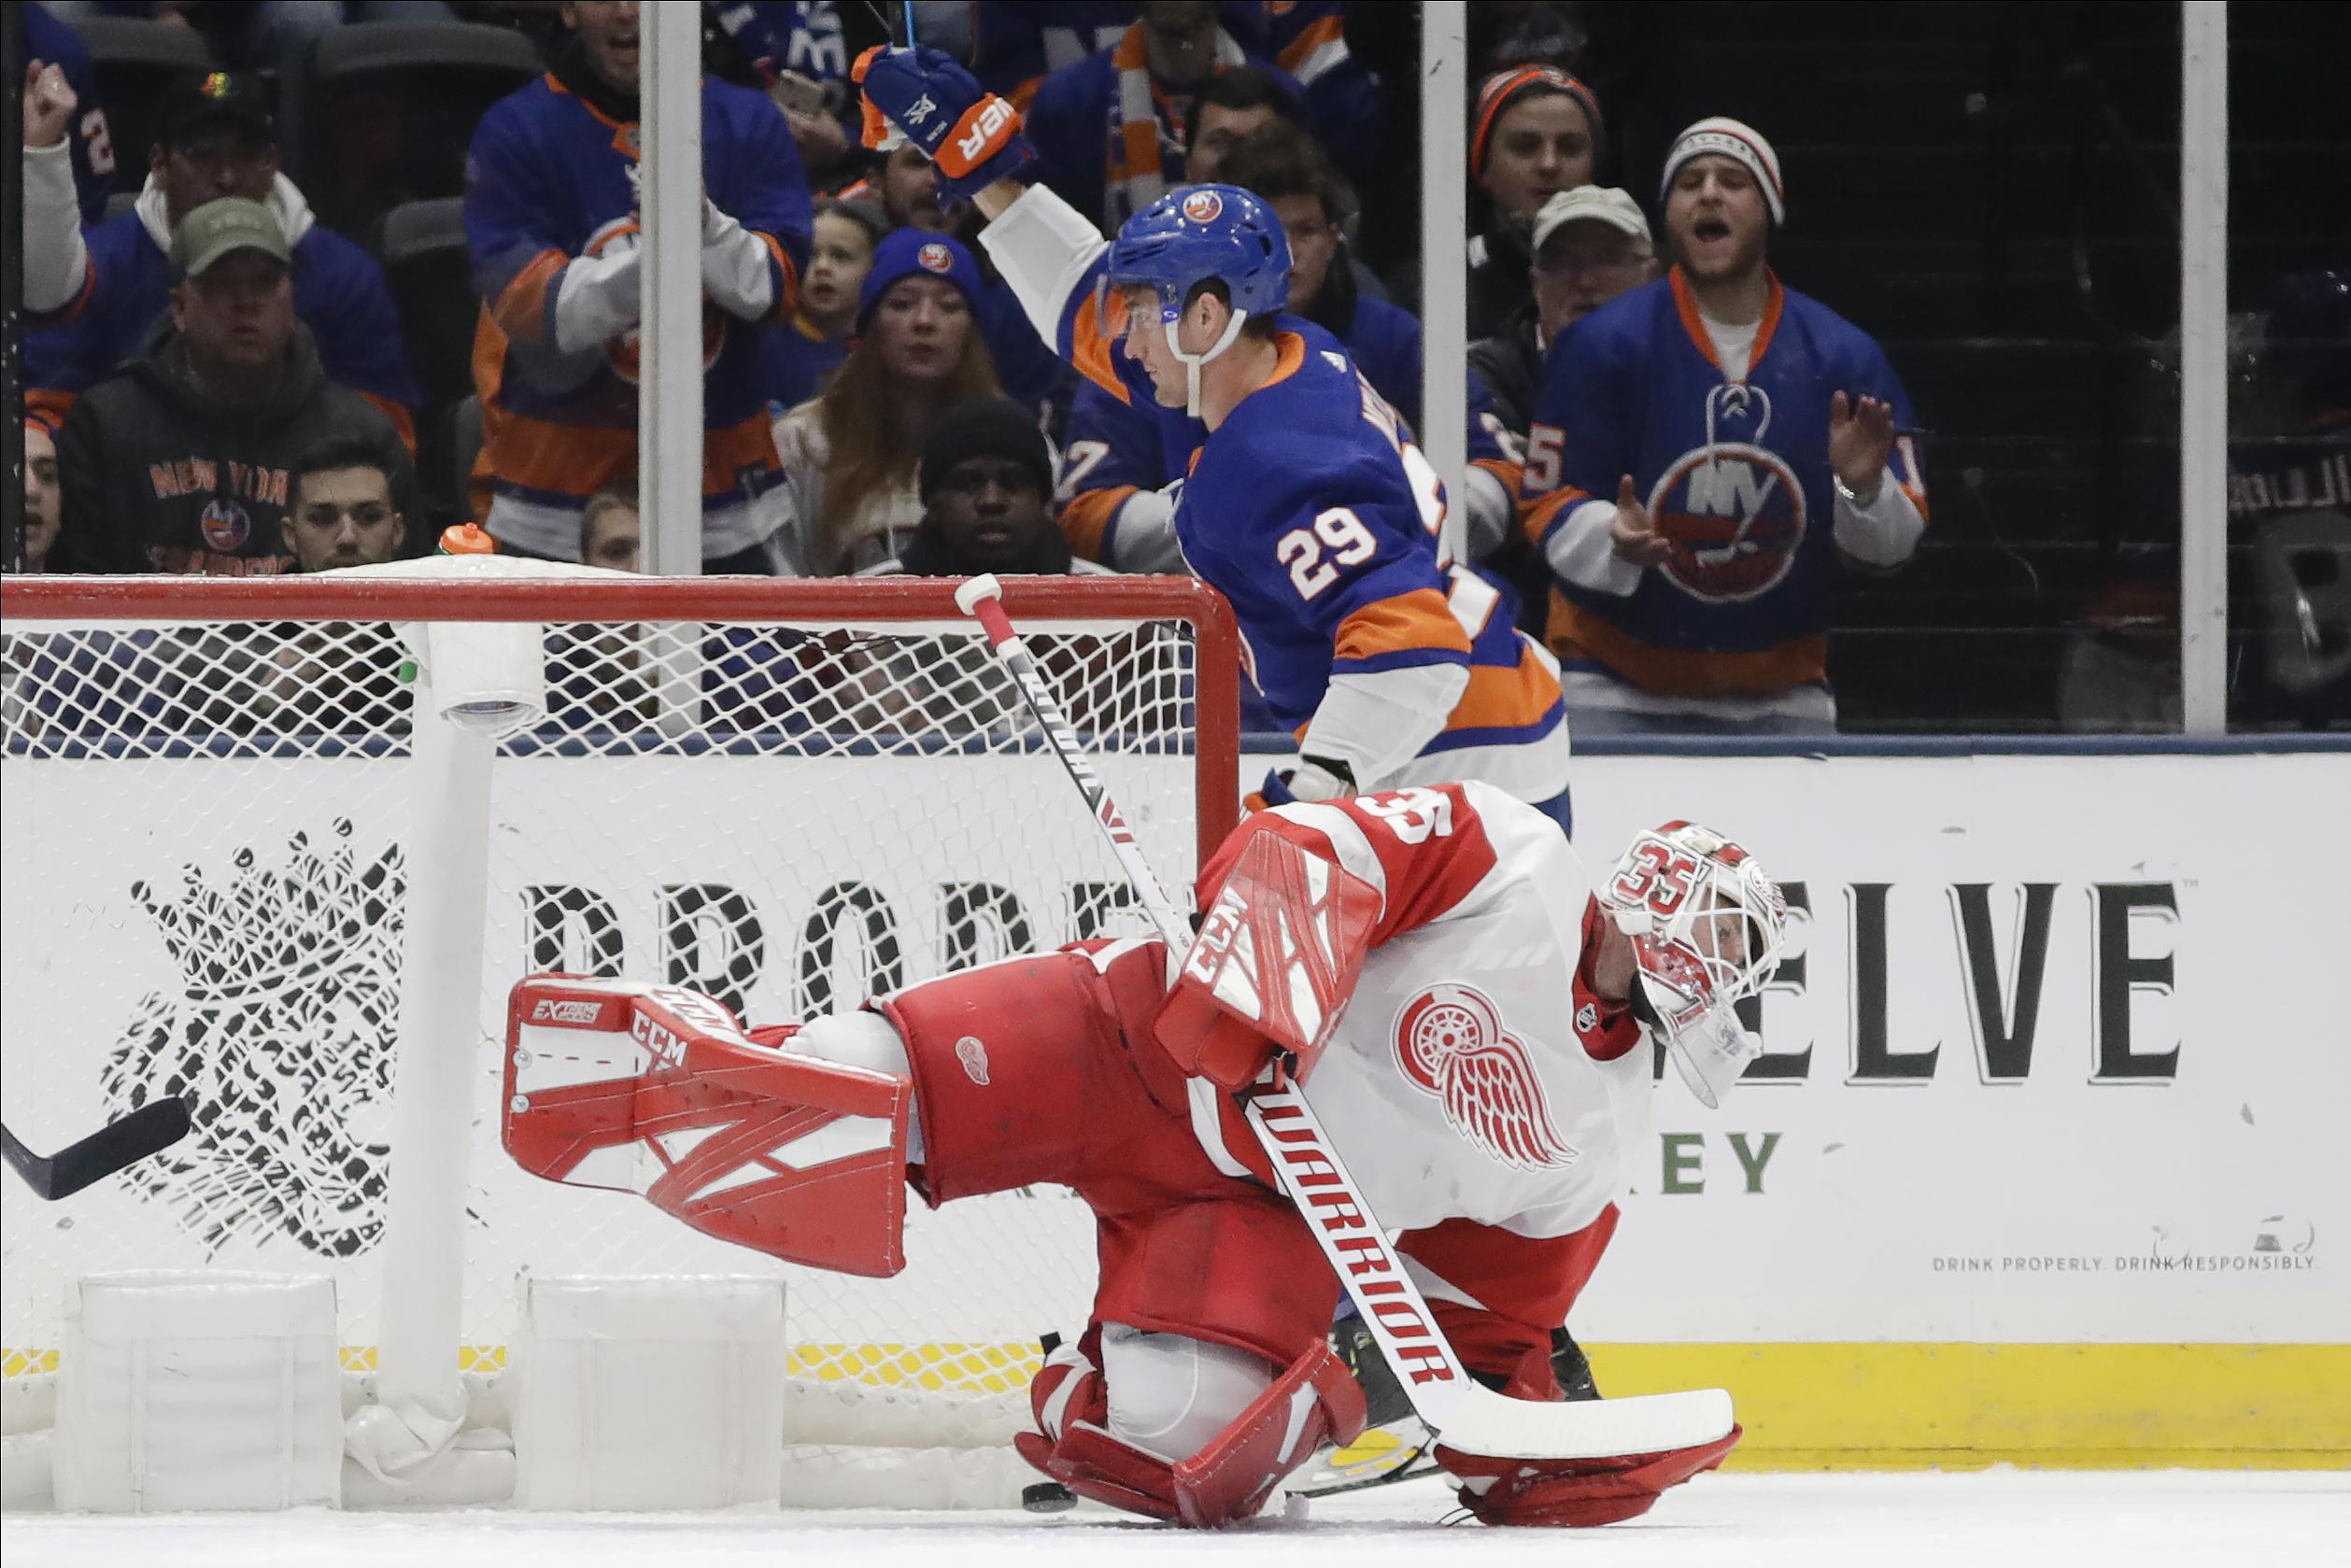 Nelson scores twice, Islanders pound Red Wings 8-2